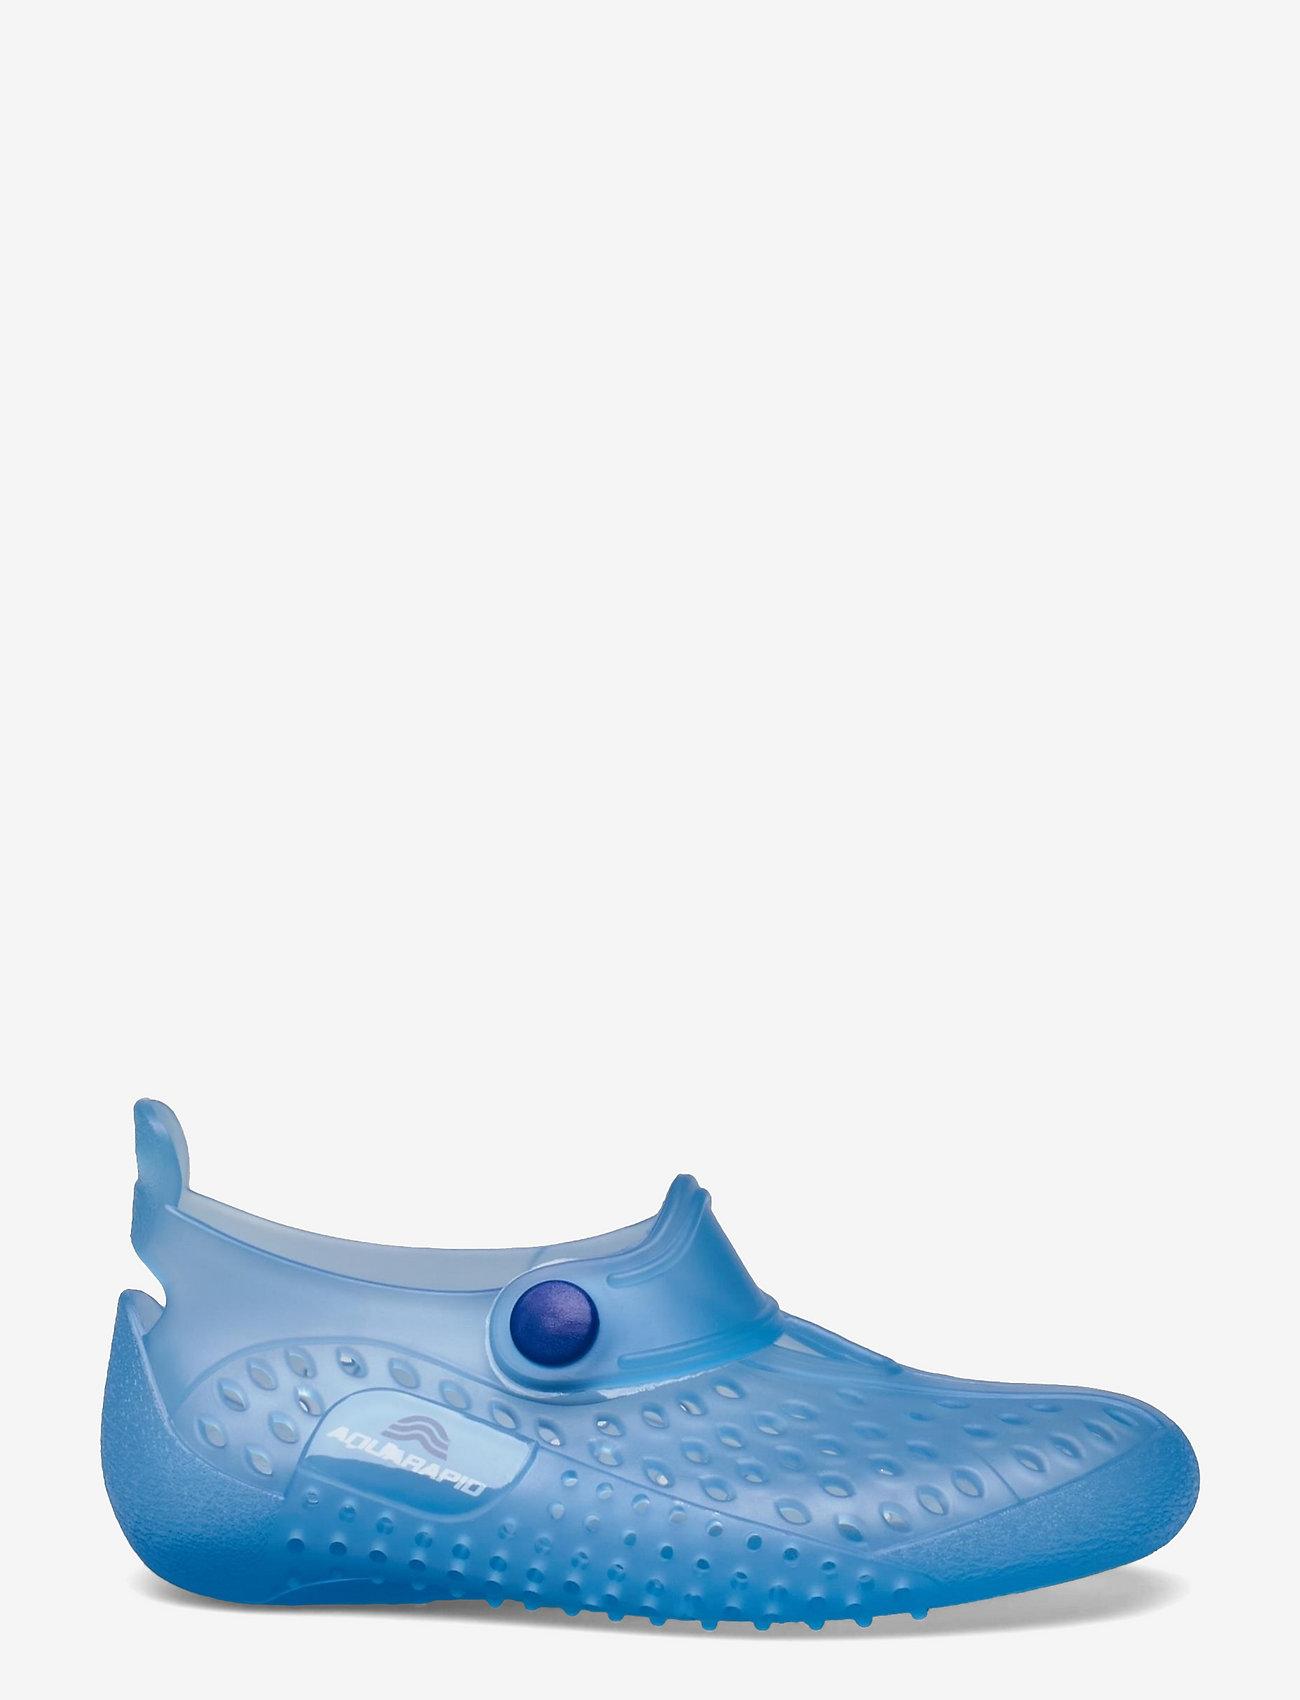 Aquarapid - Aquarapid Gal 23/24 - pool sliders - tuorquoise - 1